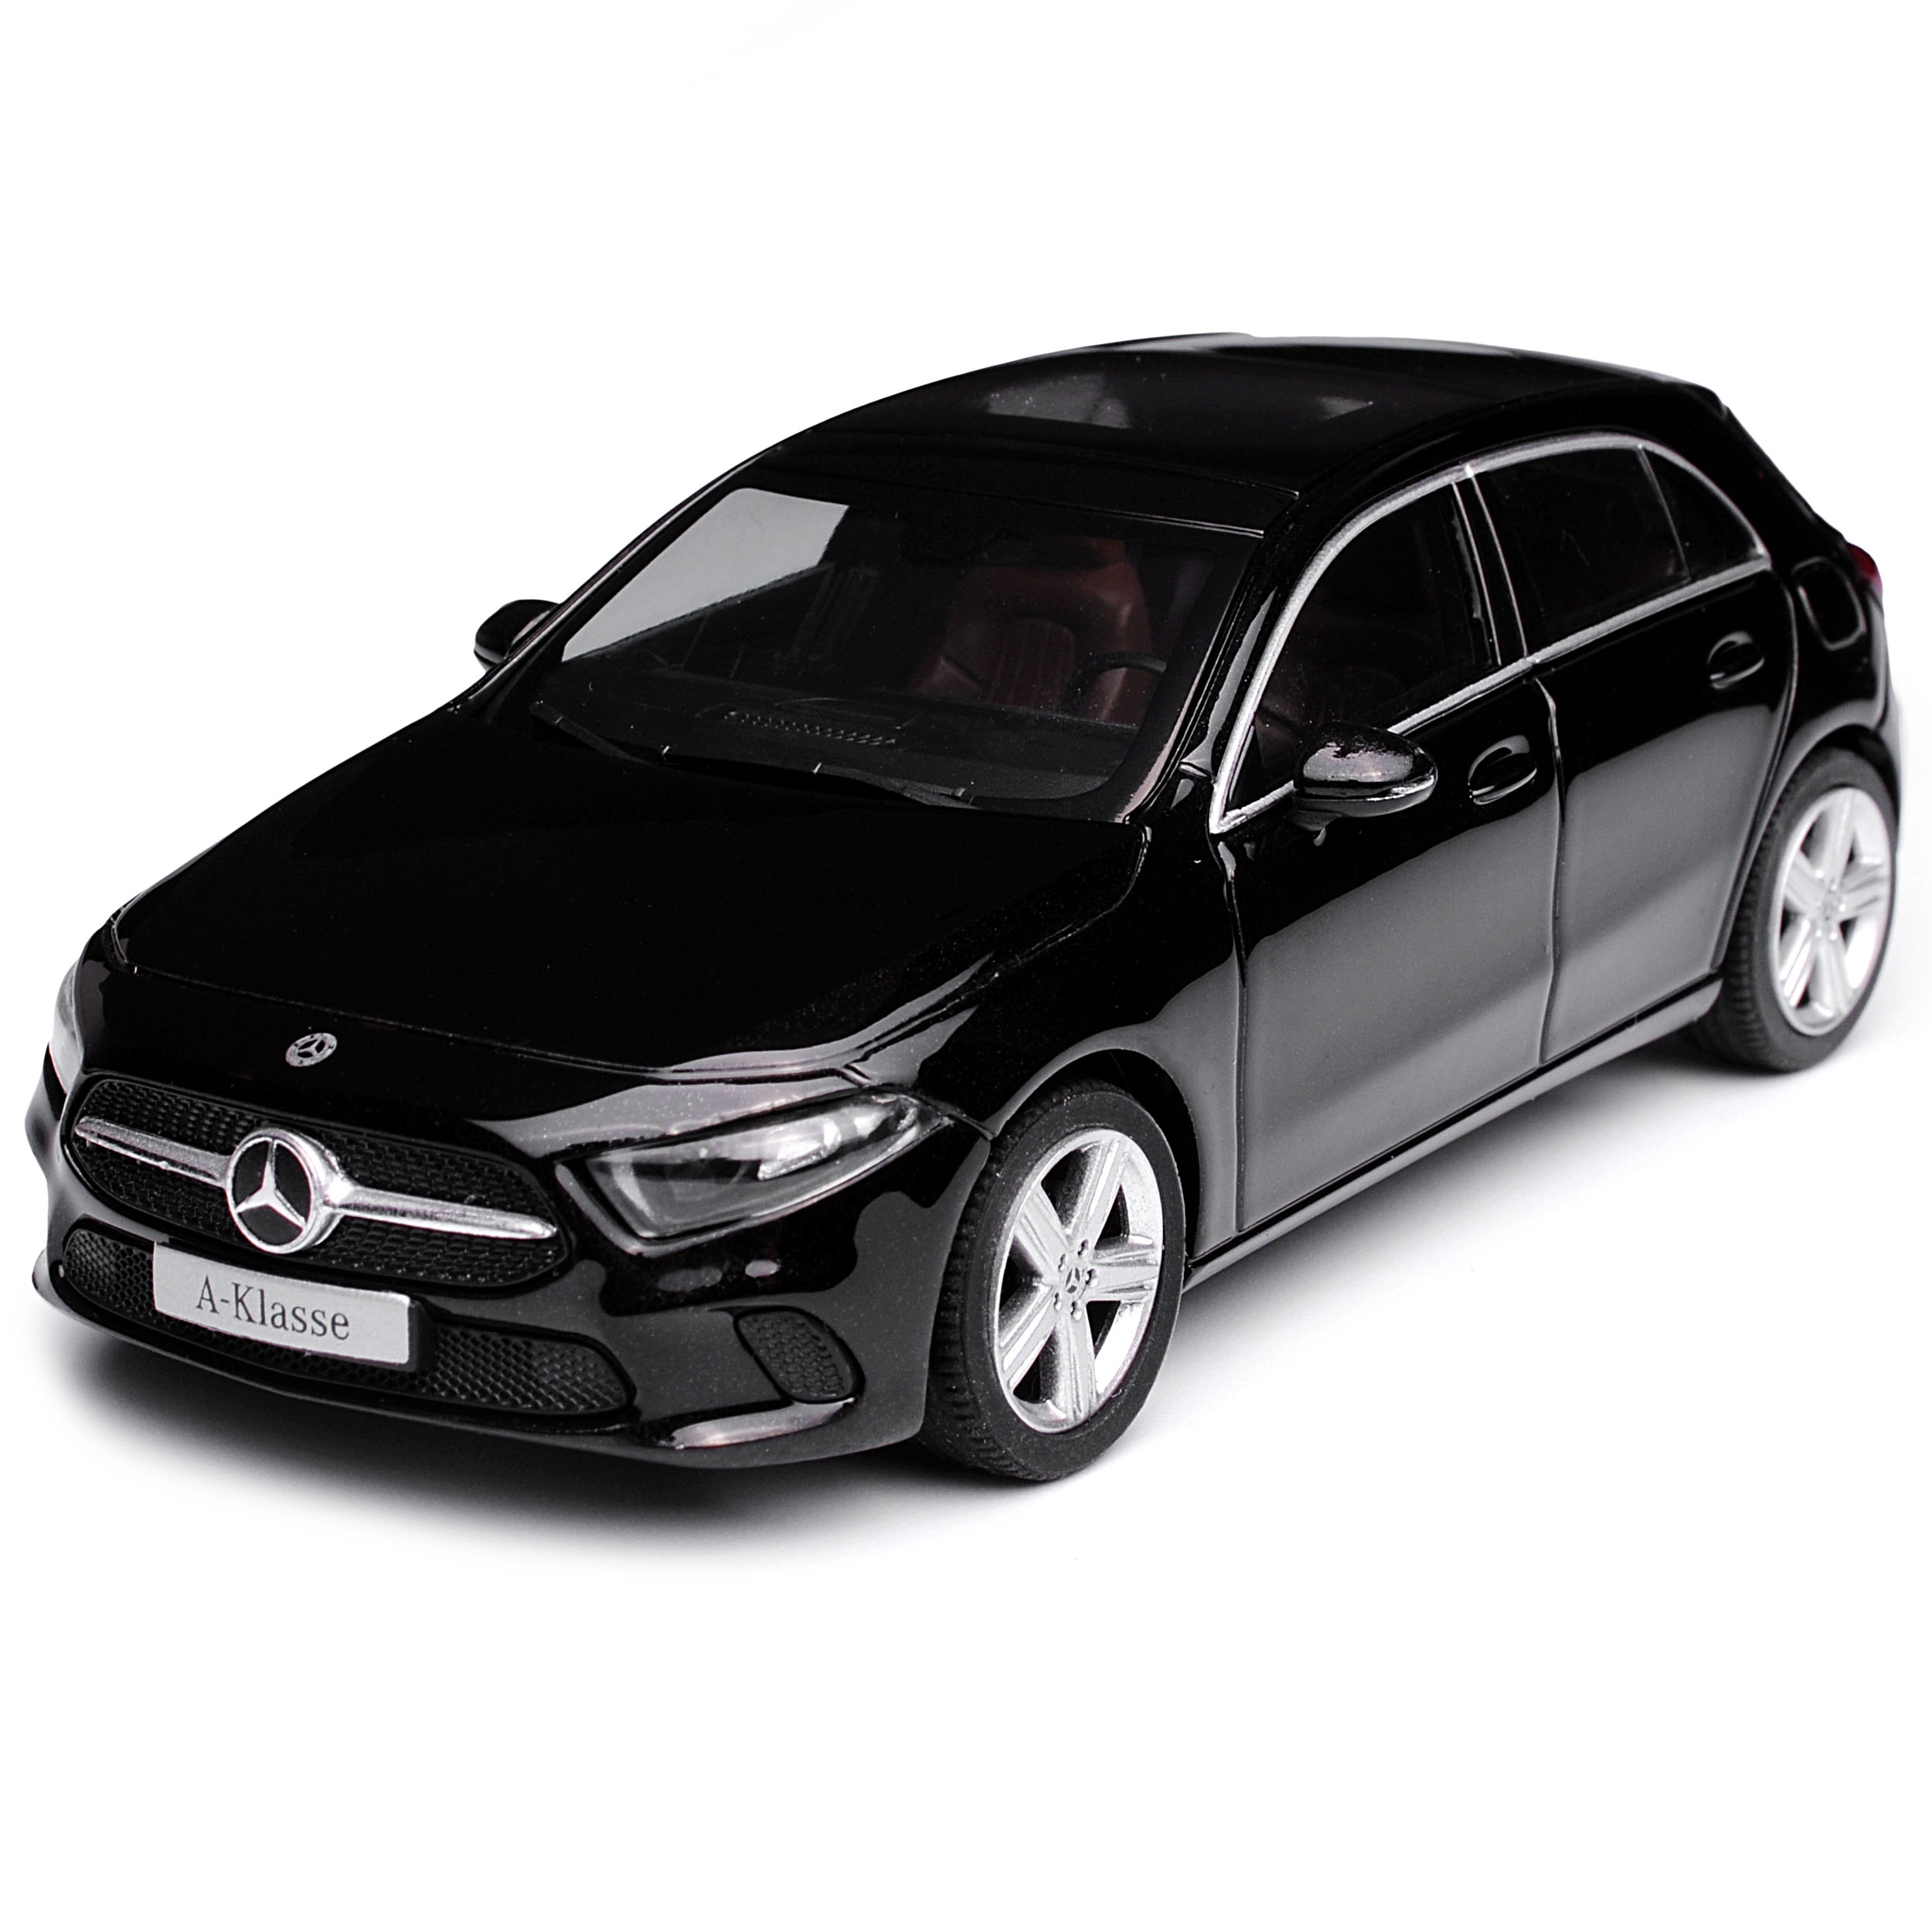 Mercedes-Benz A-Klasse W177 Kosmos black Metallic Ab Ab Ab 2017 1 43 Herpa Modell .. 24596f